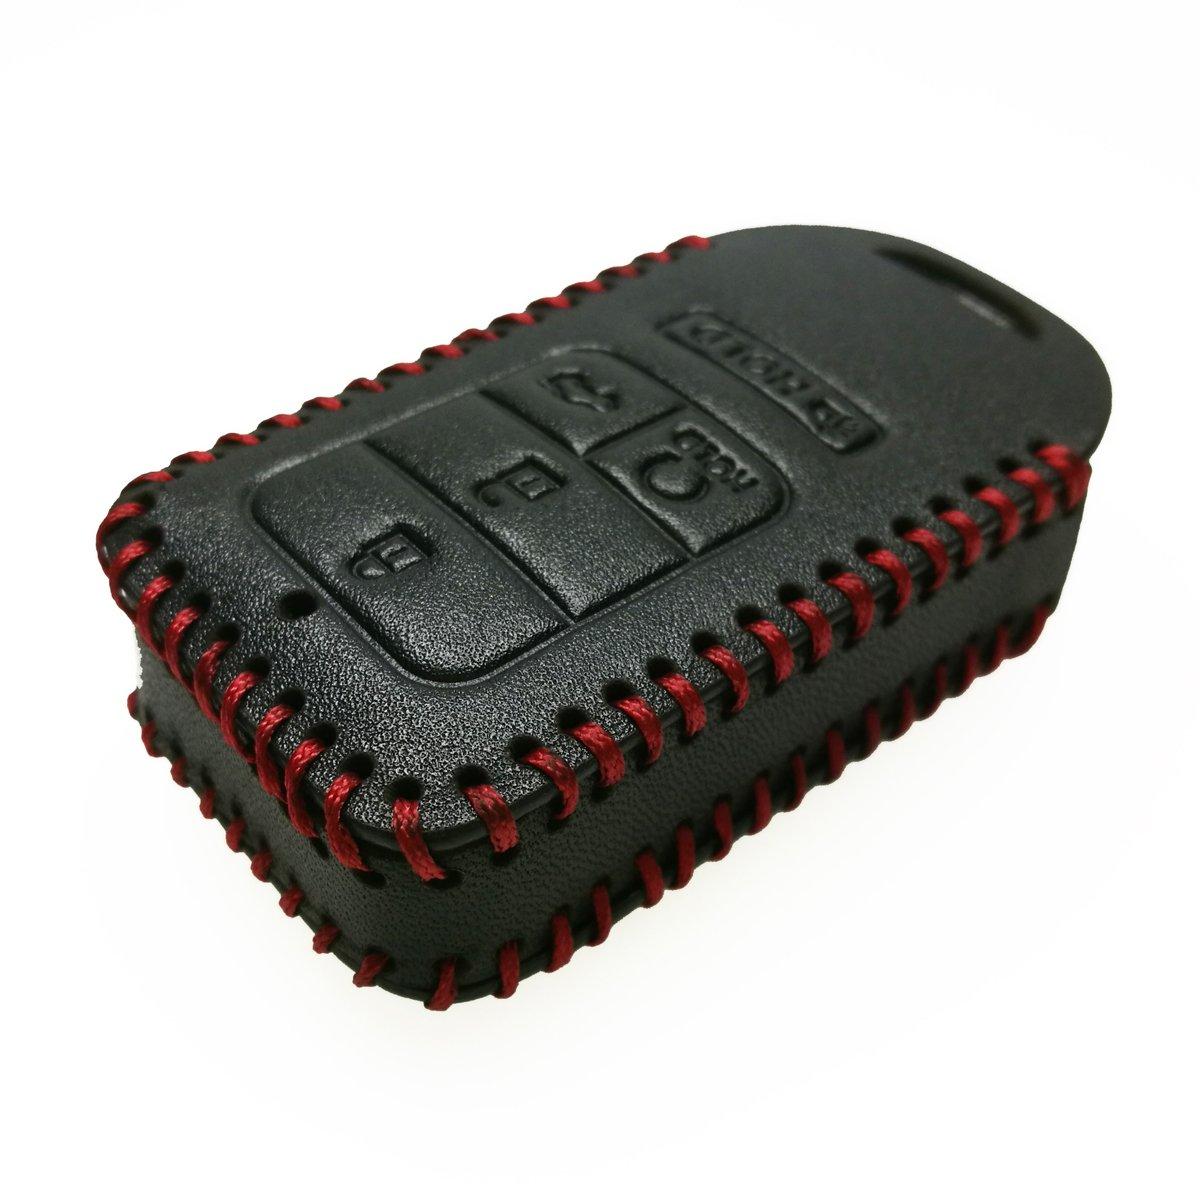 Coolbestda Latest Leather Key Fob Remote Cover Case Protector Skin Keyless Jacket Holder for A2C81642600 2018 2017 2016 2015 Honda Accord Civic CR-V CRV Pilot EX EX-L Touring Premium